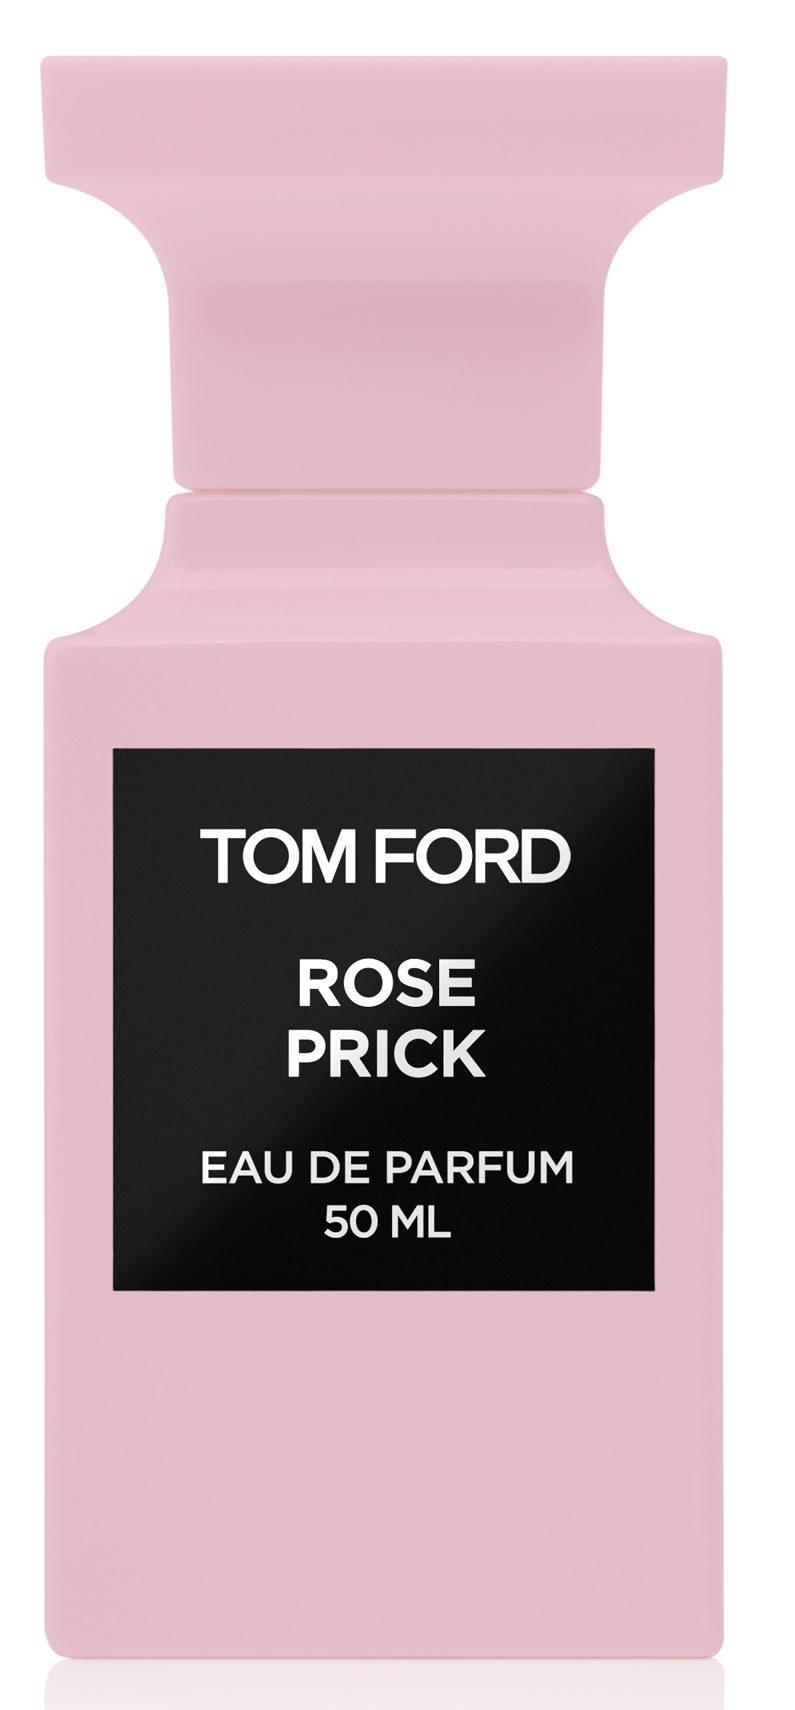 TOM_FORD_ROSE_PRICK-